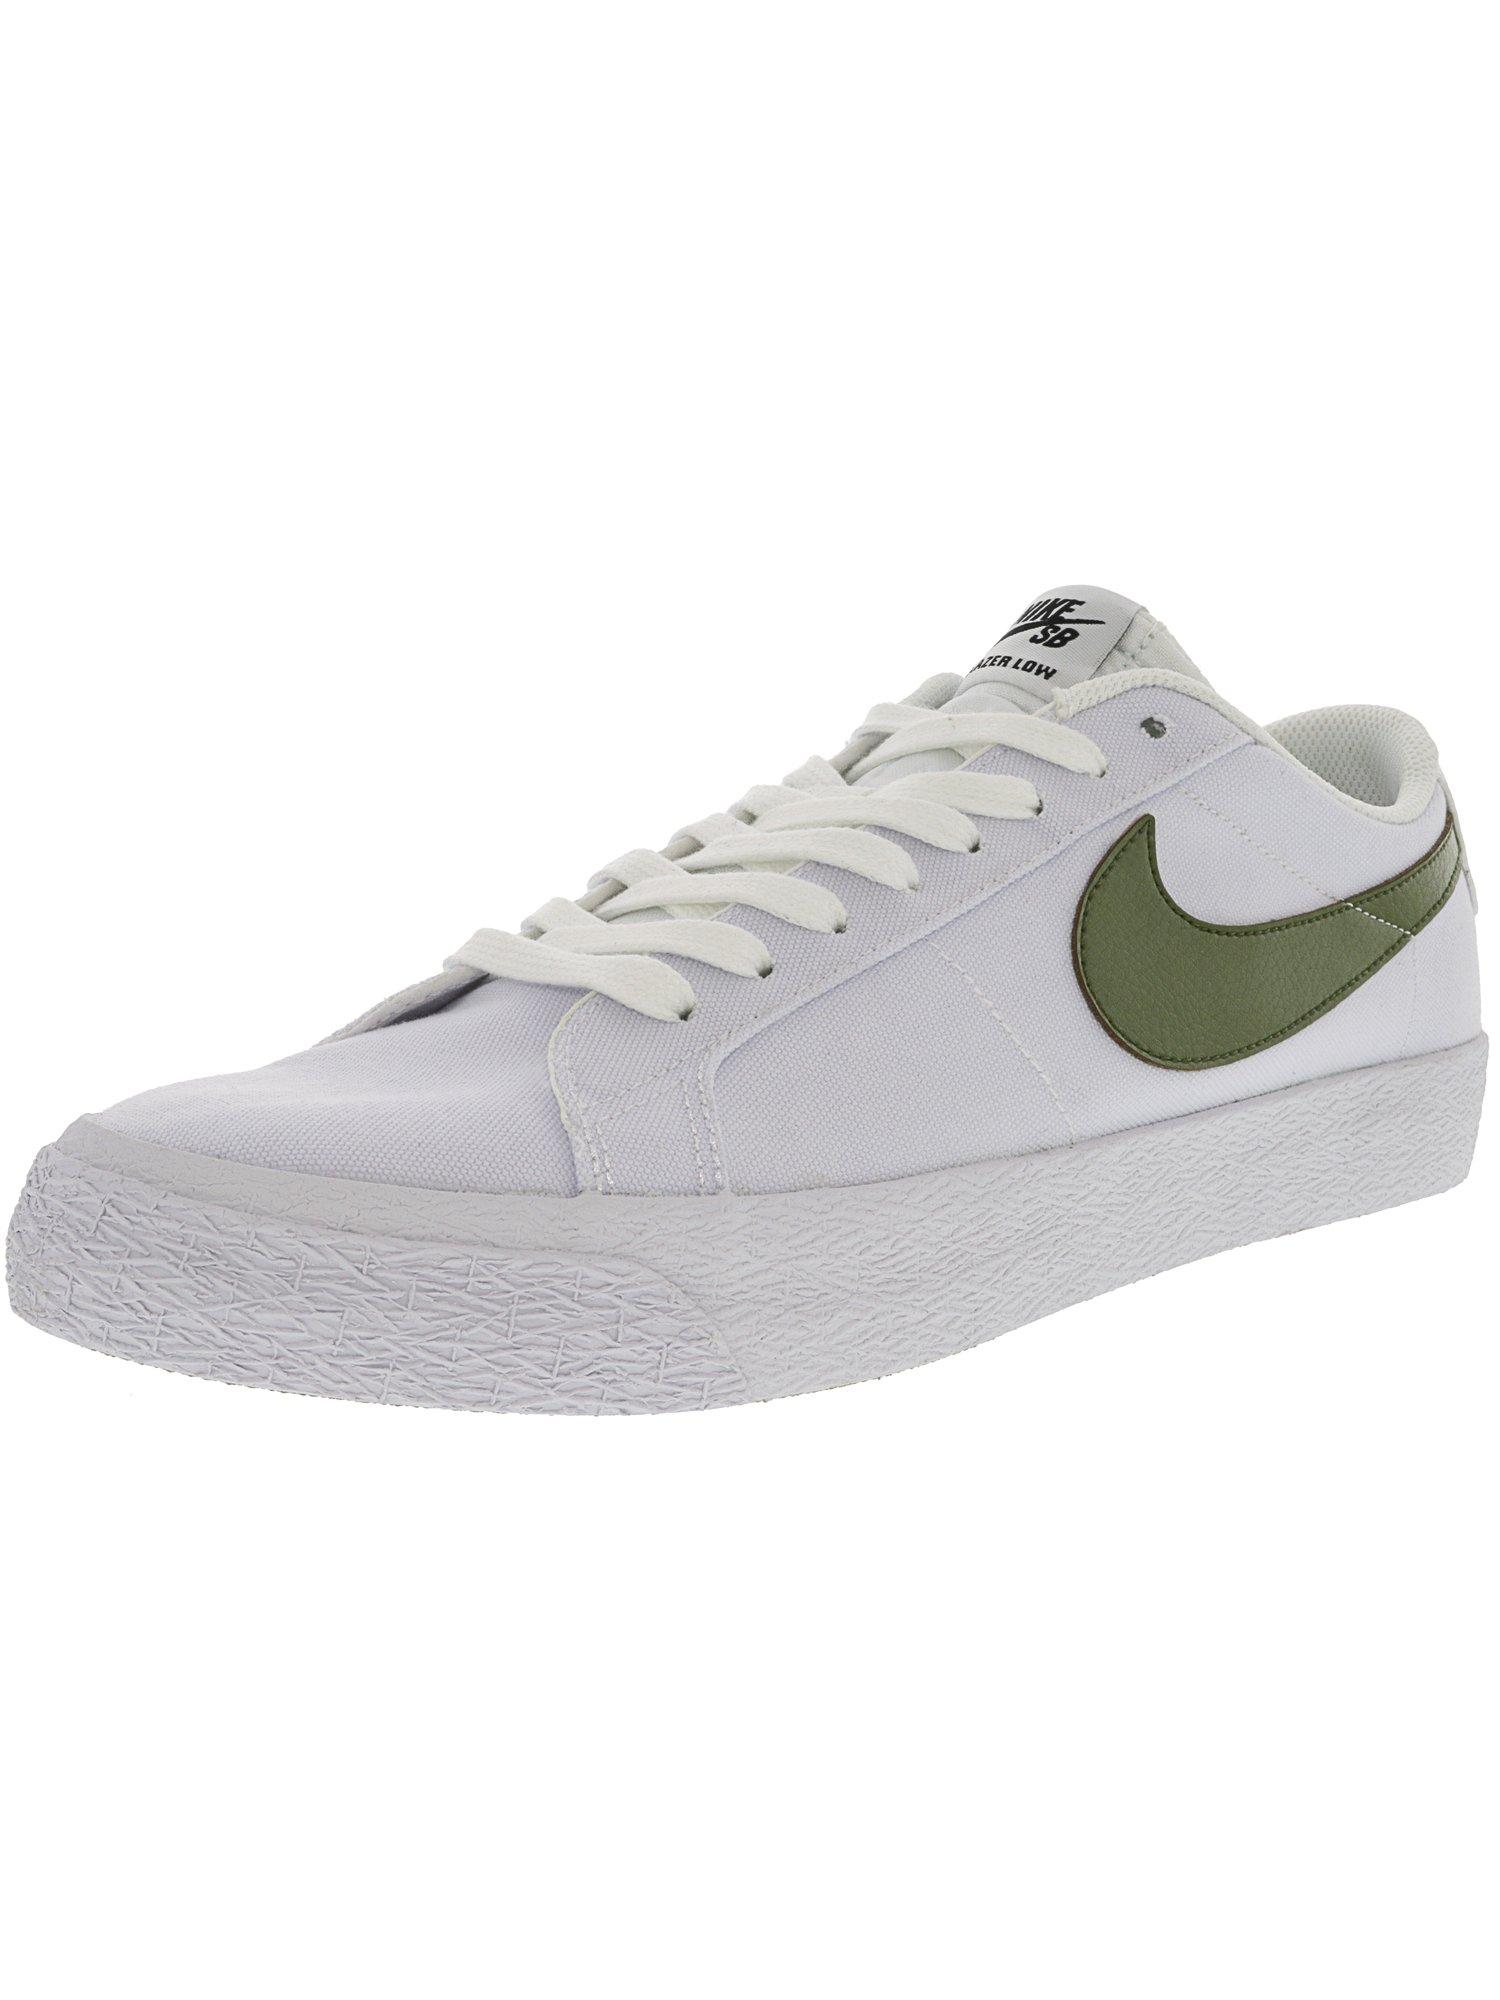 new concept aa36b bfb15 Nike Men s Sb Blazer Zoom Low Top Canvas Skateboarding Shoe  35.99 Ebay